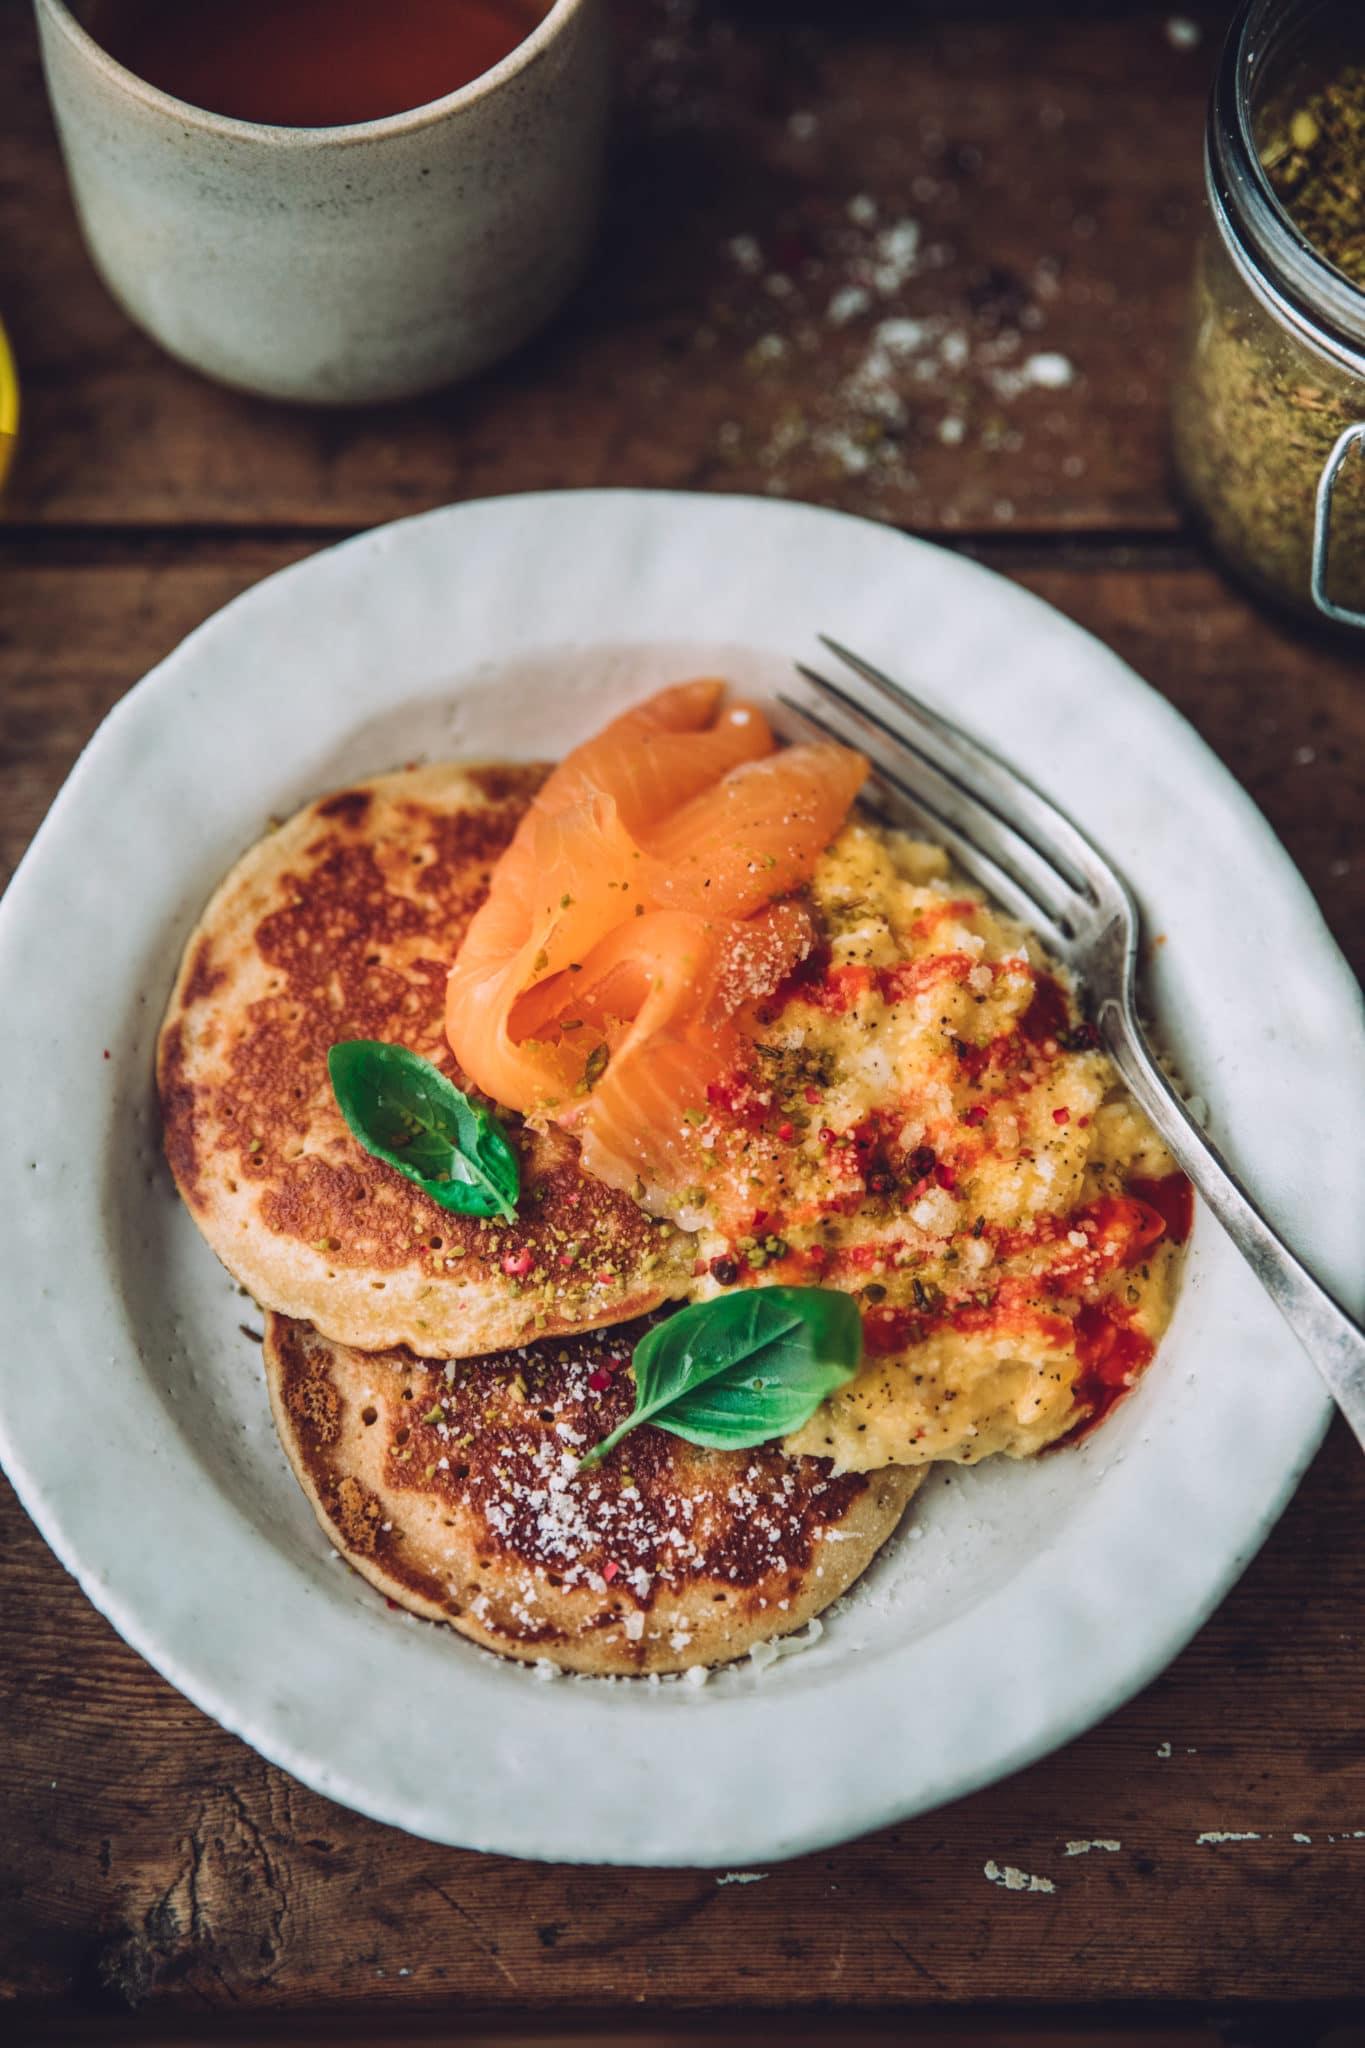 Pancakes Mégane Arderighi Megandcook styliste culinaire